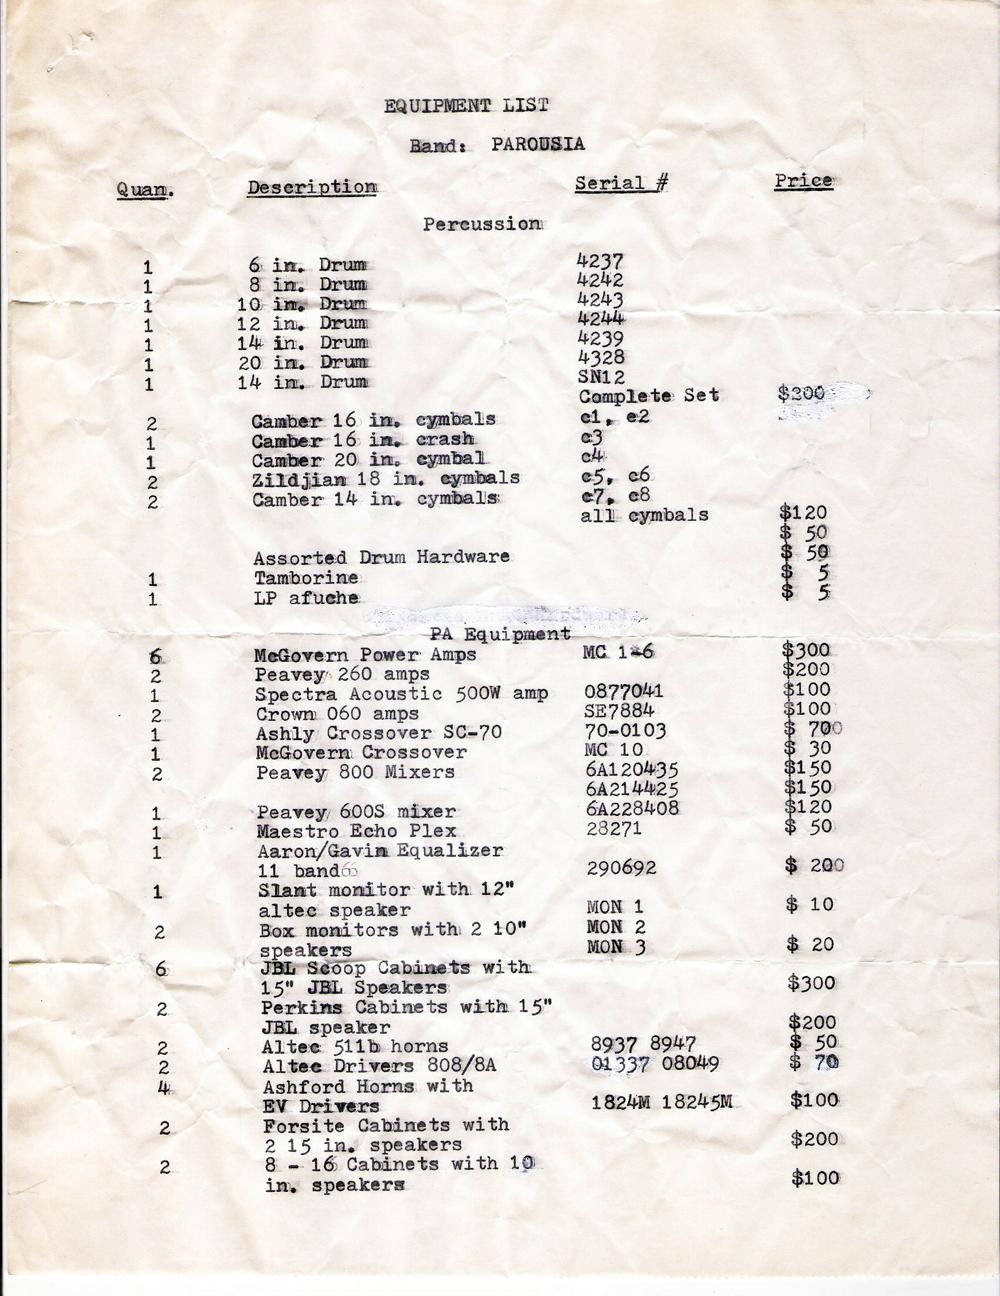 Port Colborne Equipment list